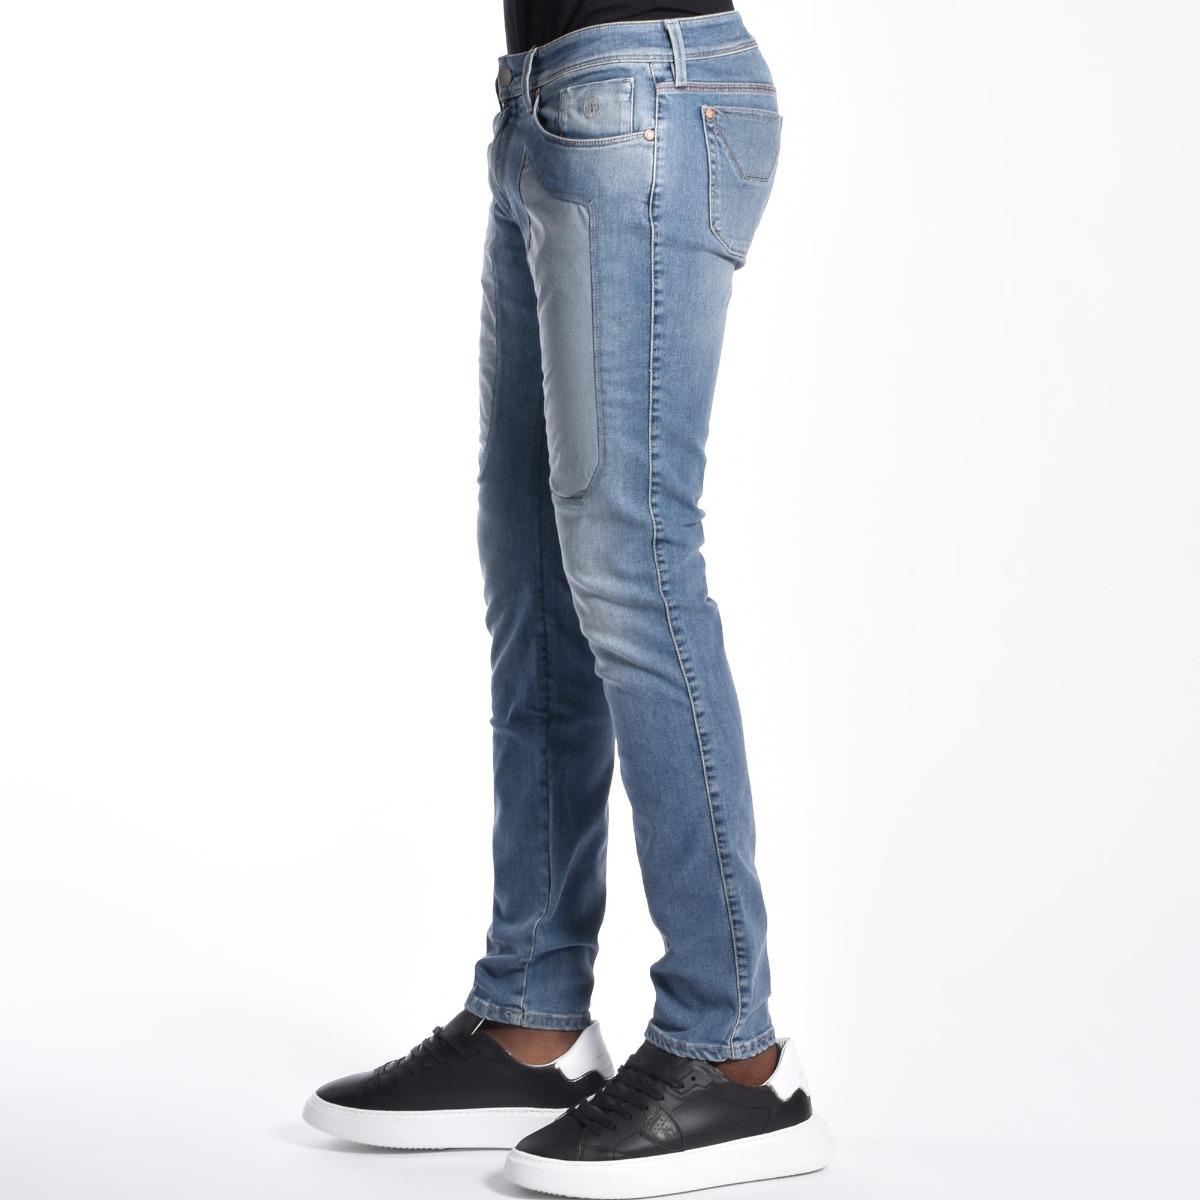 Jeans toppa alcantara - Denim